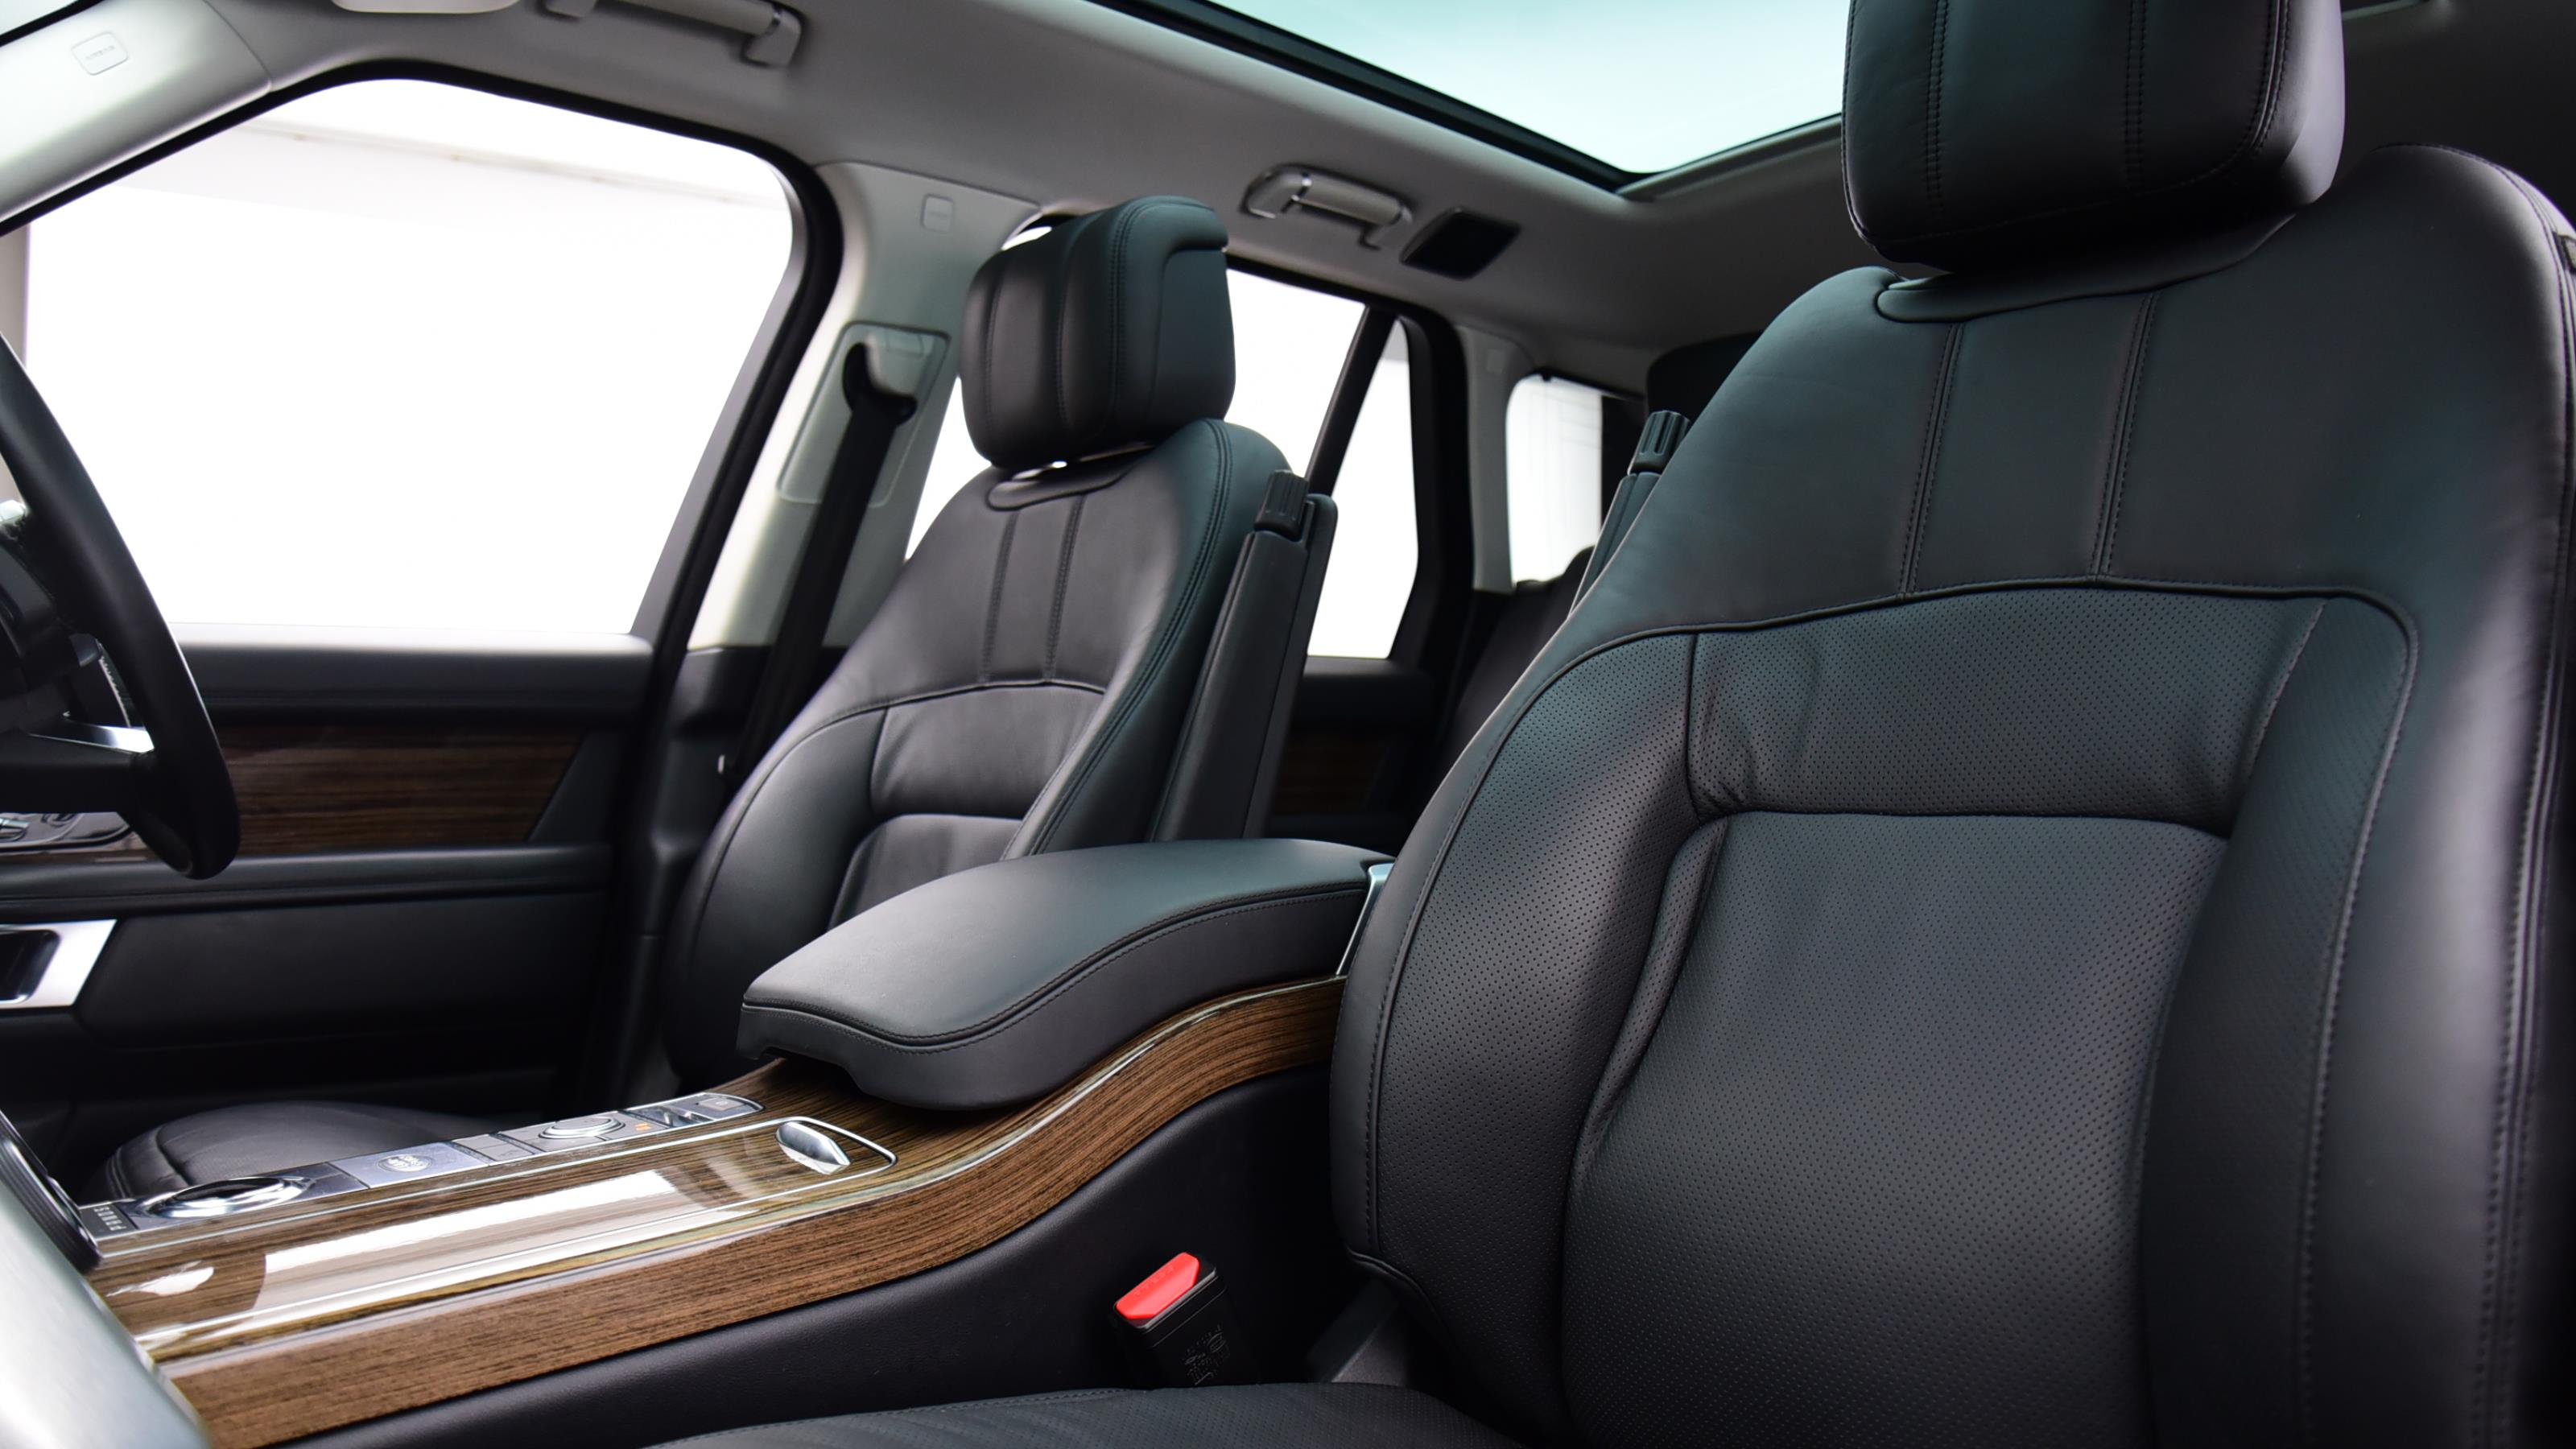 Used 2018 Land Rover RANGE ROVER 3.0 TDV6 Vogue 4dr Auto BLACK at Saxton4x4